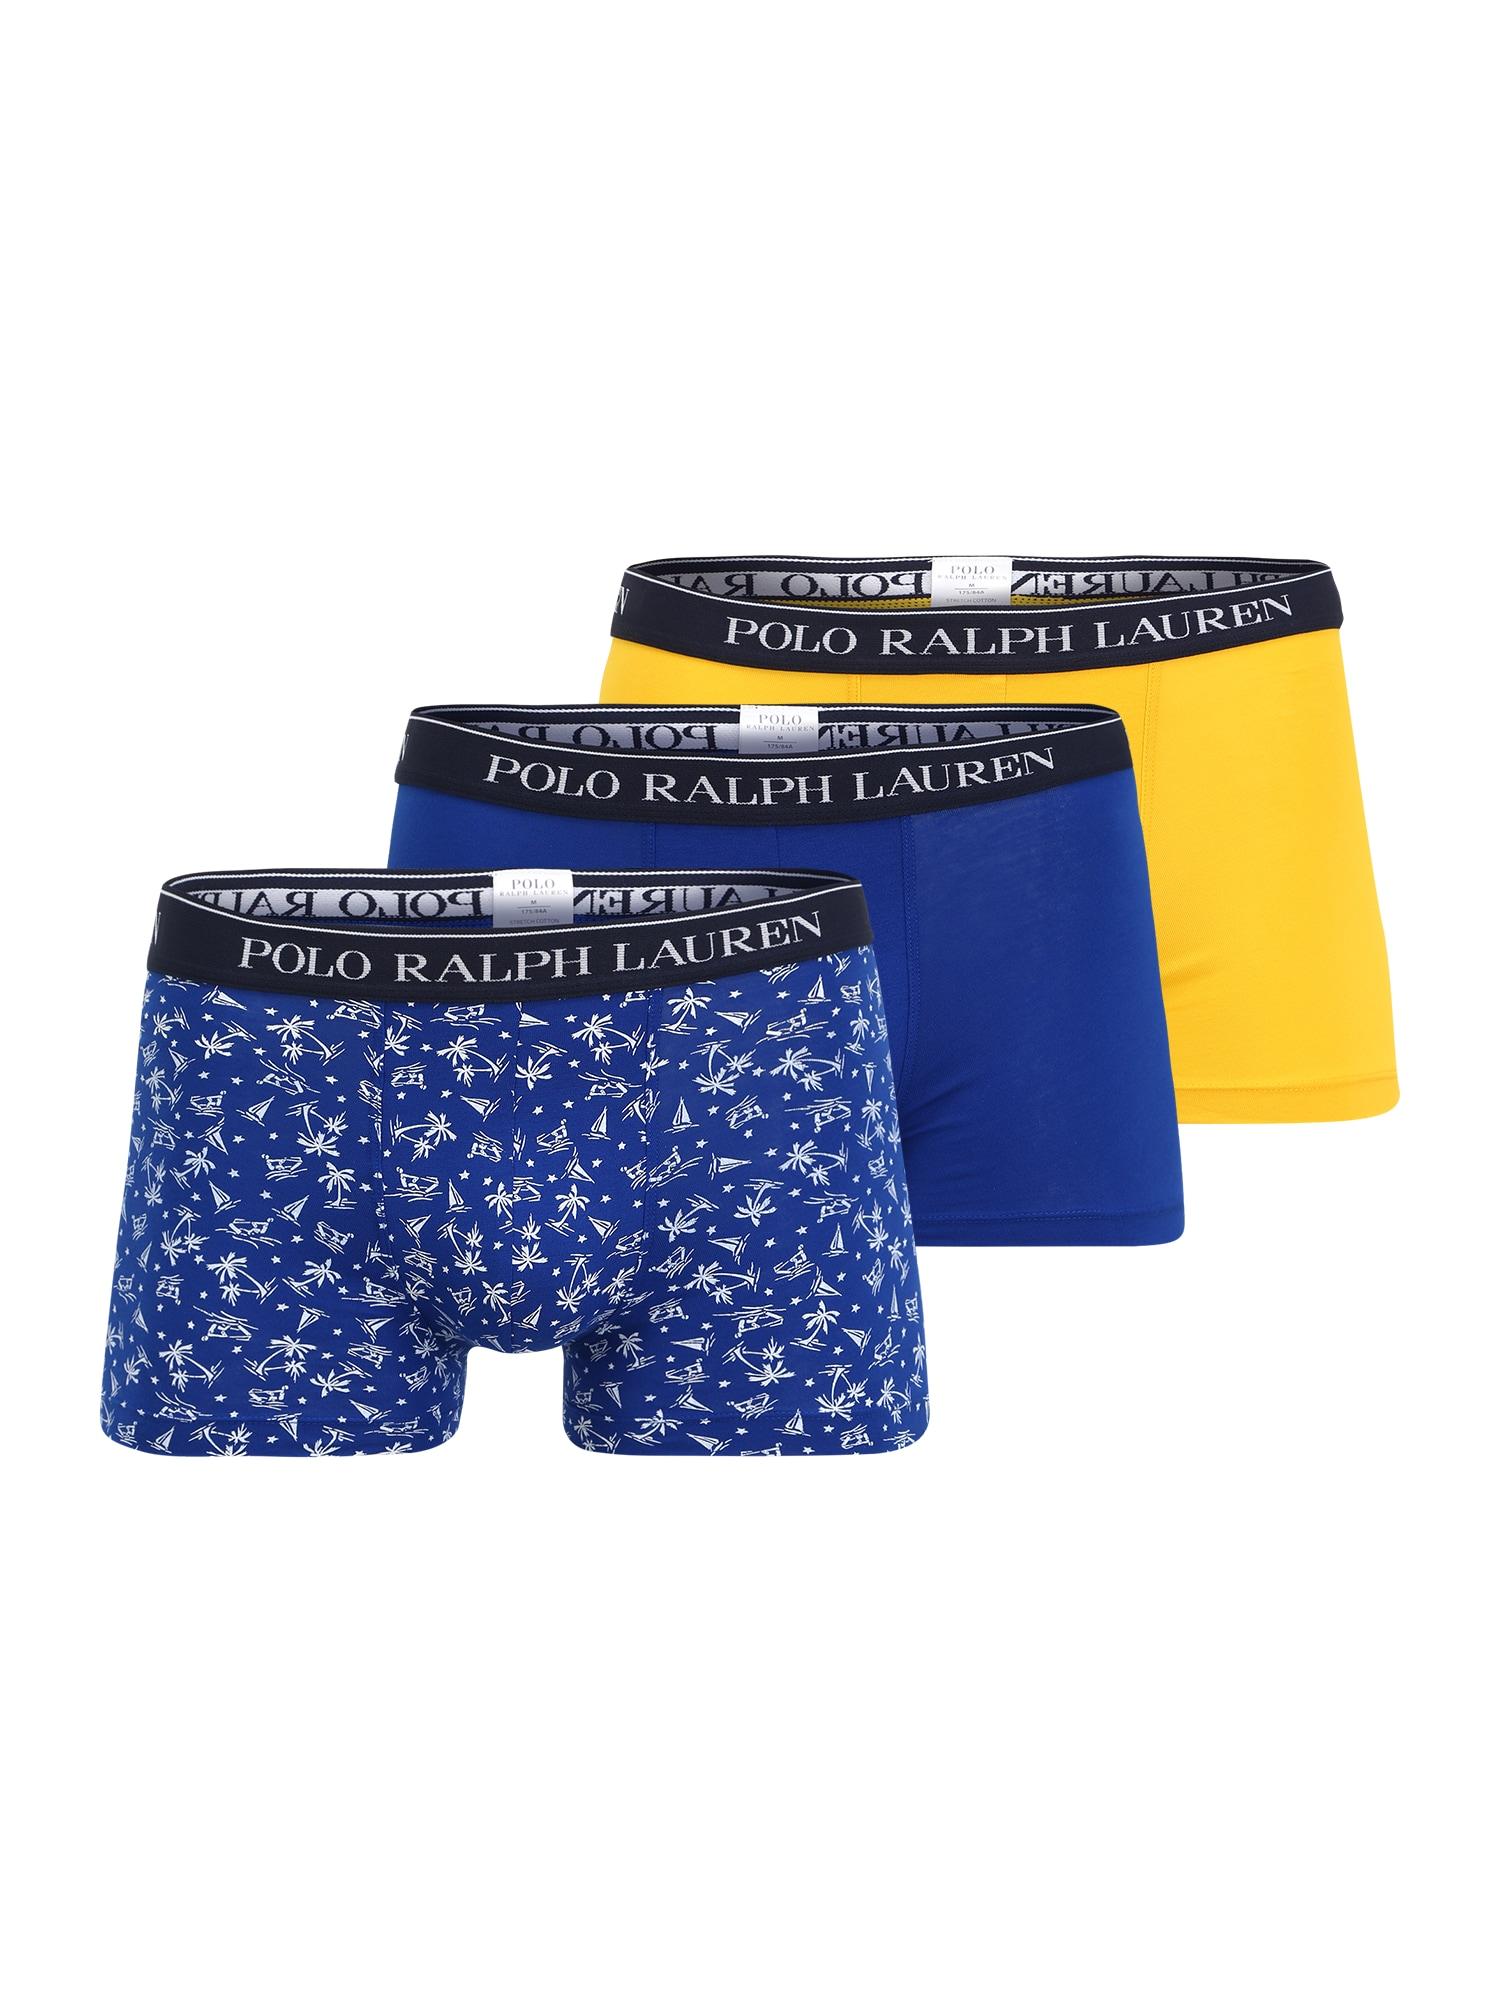 POLO RALPH LAUREN Boxer trumpikės mėlyna / geltona / juoda / balta